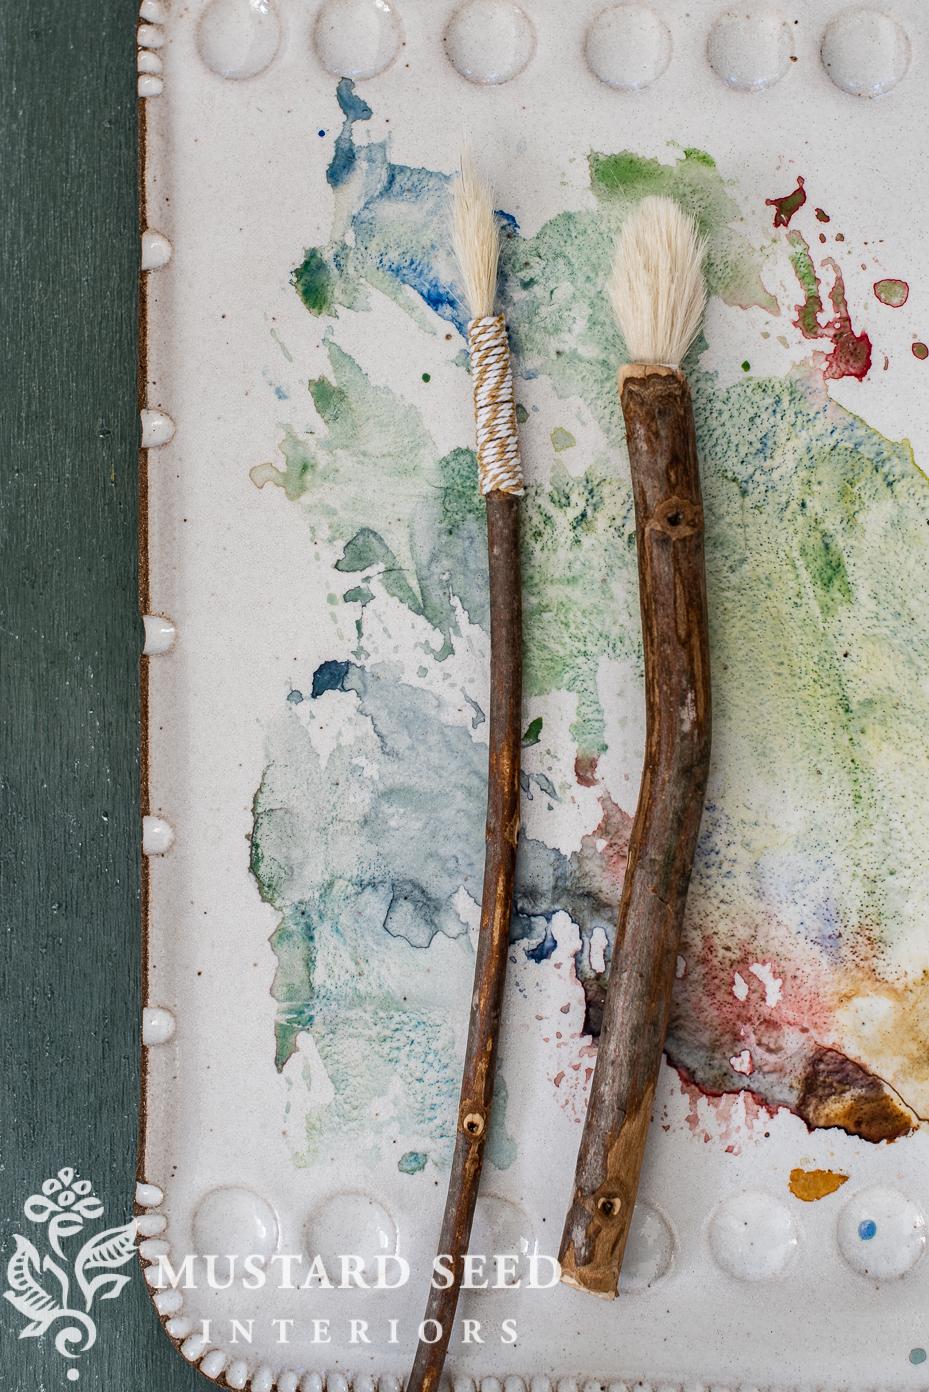 handmade brushes and pens   organic artist   miss mustard seed